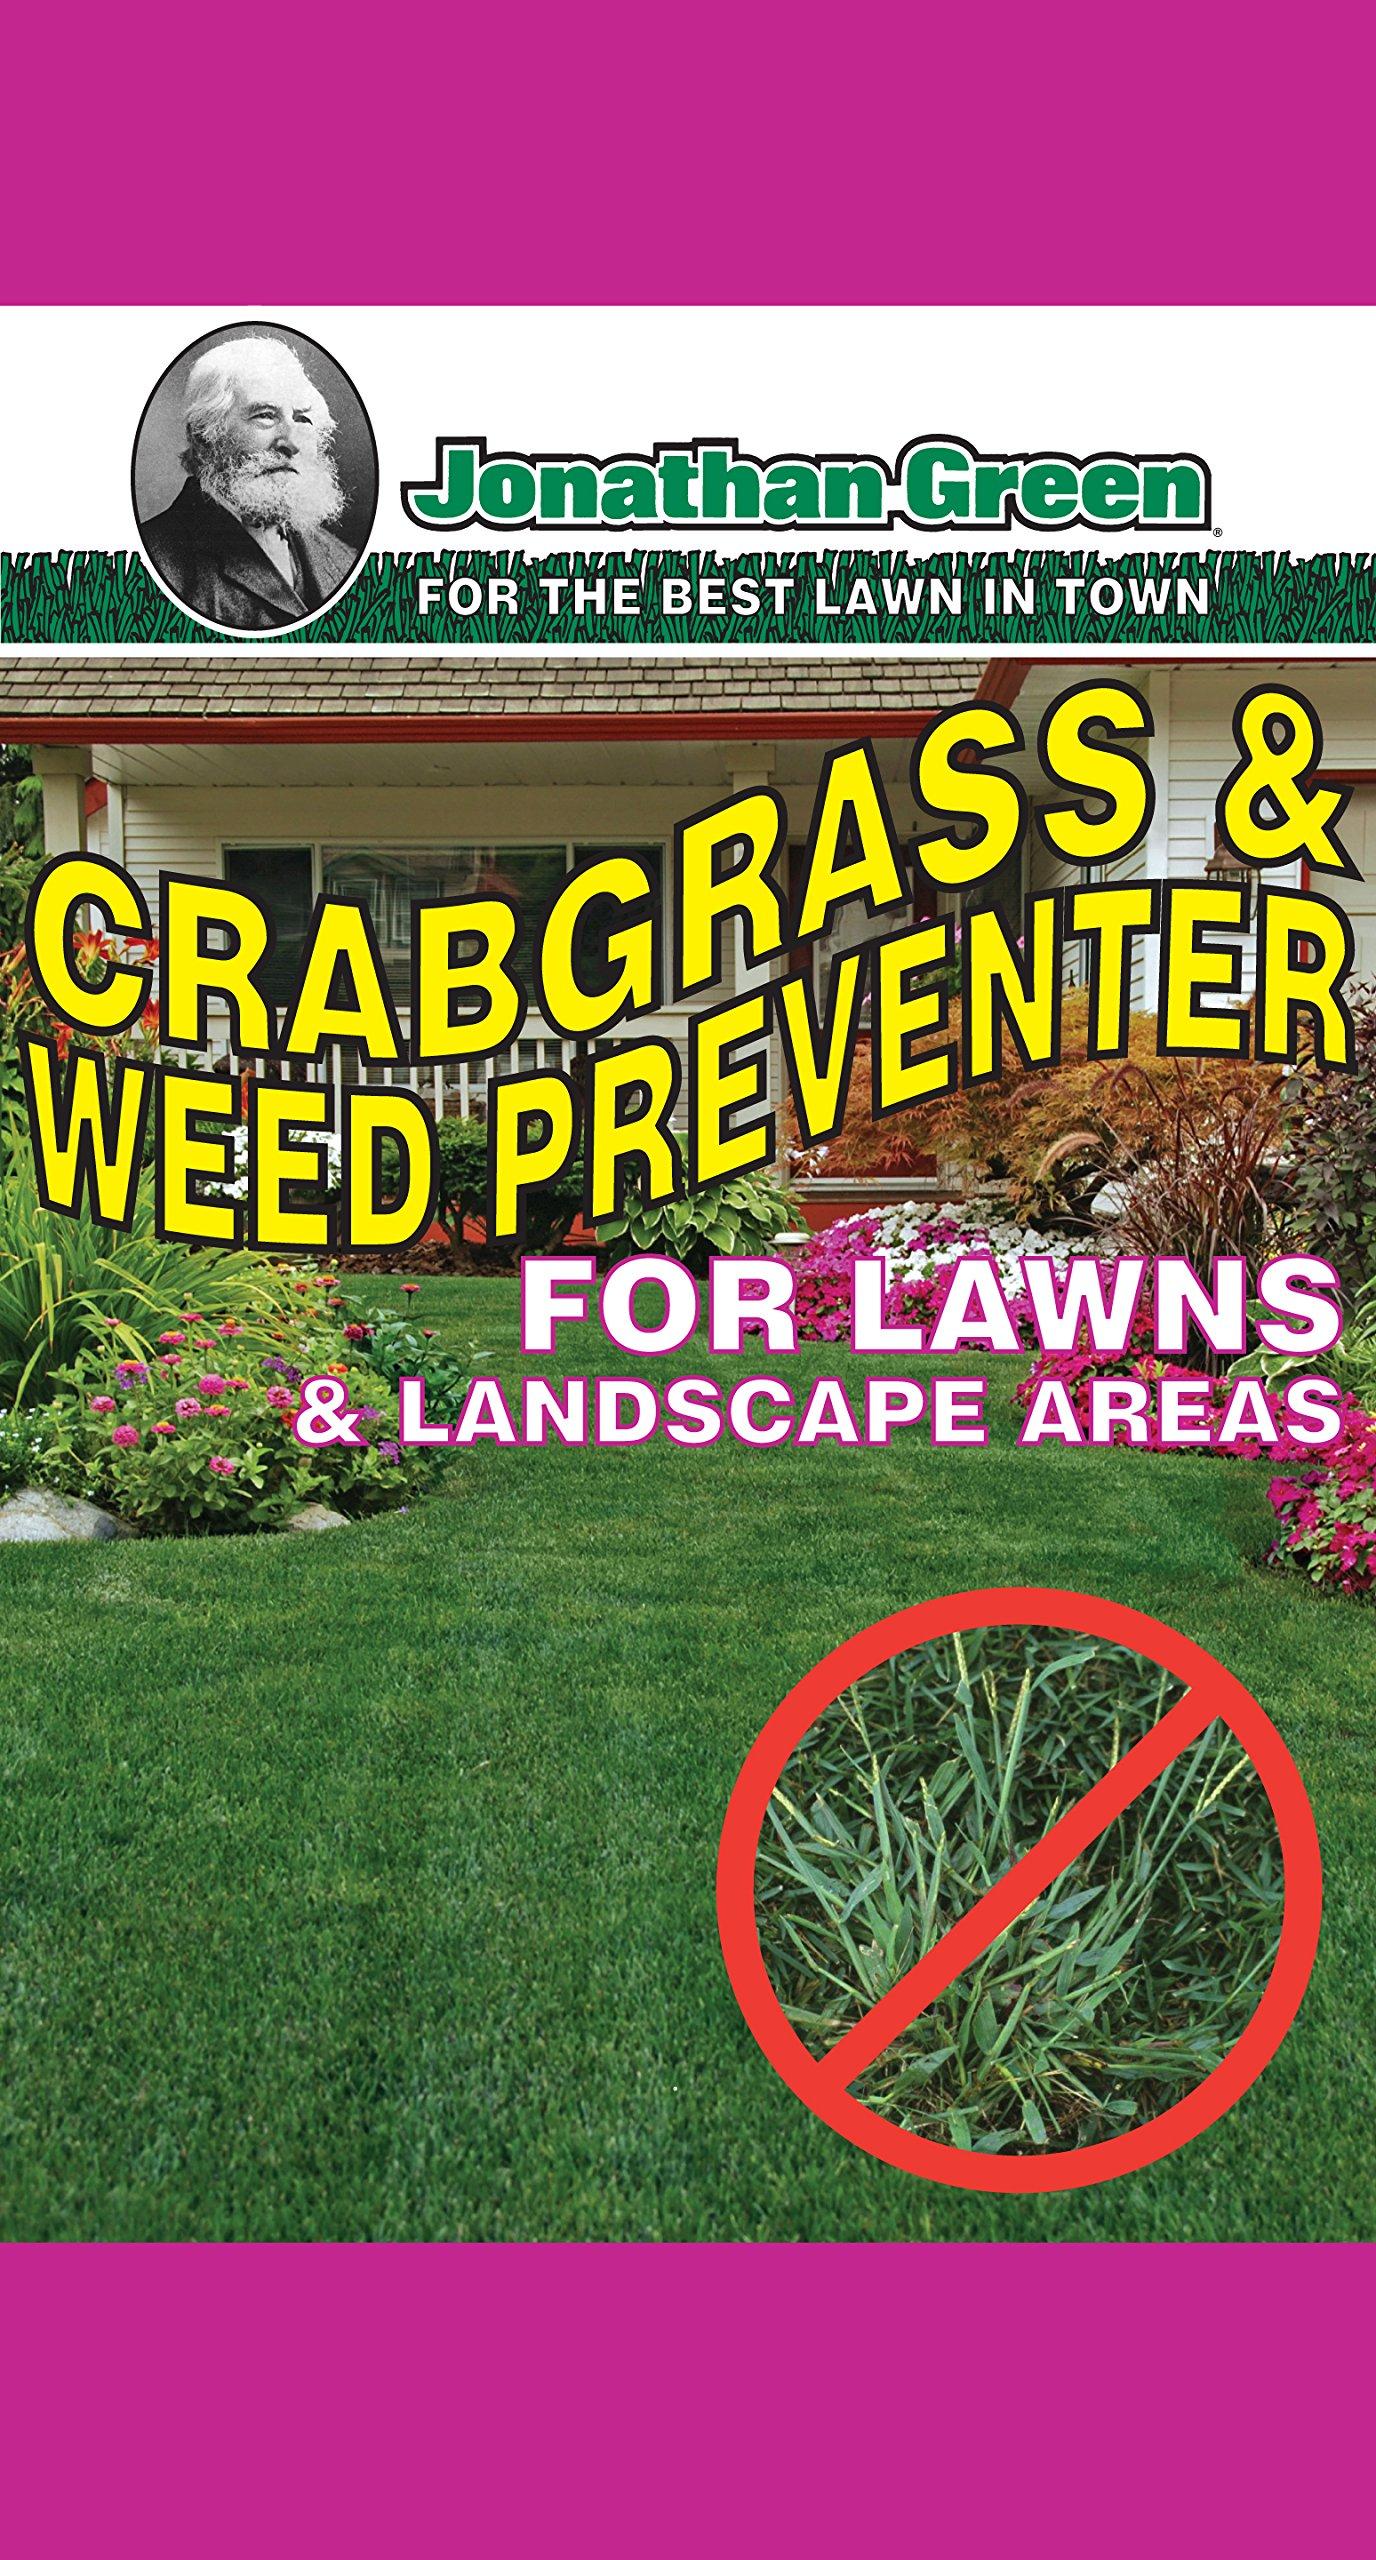 Jonathan Green SONS 12350 5M Crabgrass Preventer